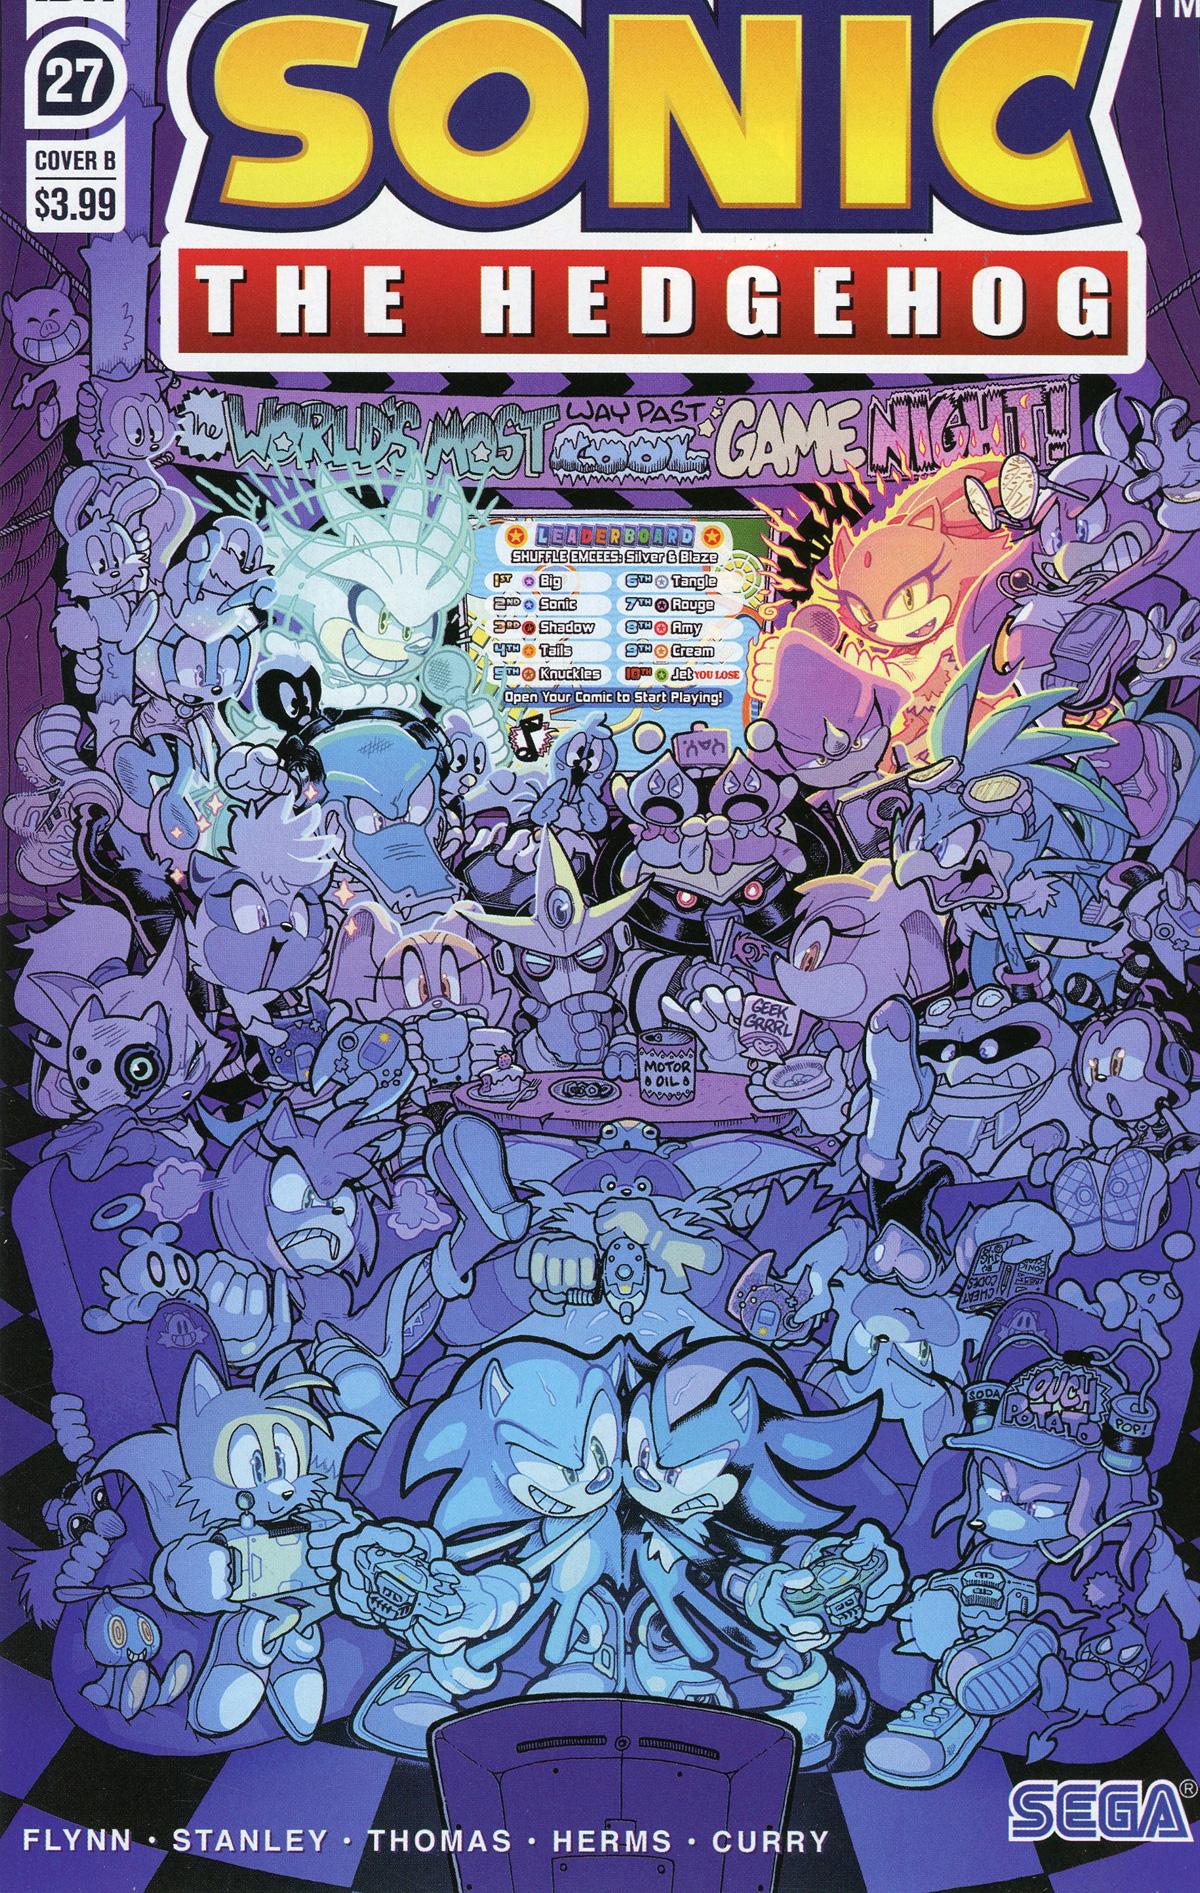 Sonic The Hedgehog Vol 3 #27 Cover B Variant Jonathan Gray & Reggie Graham Cover